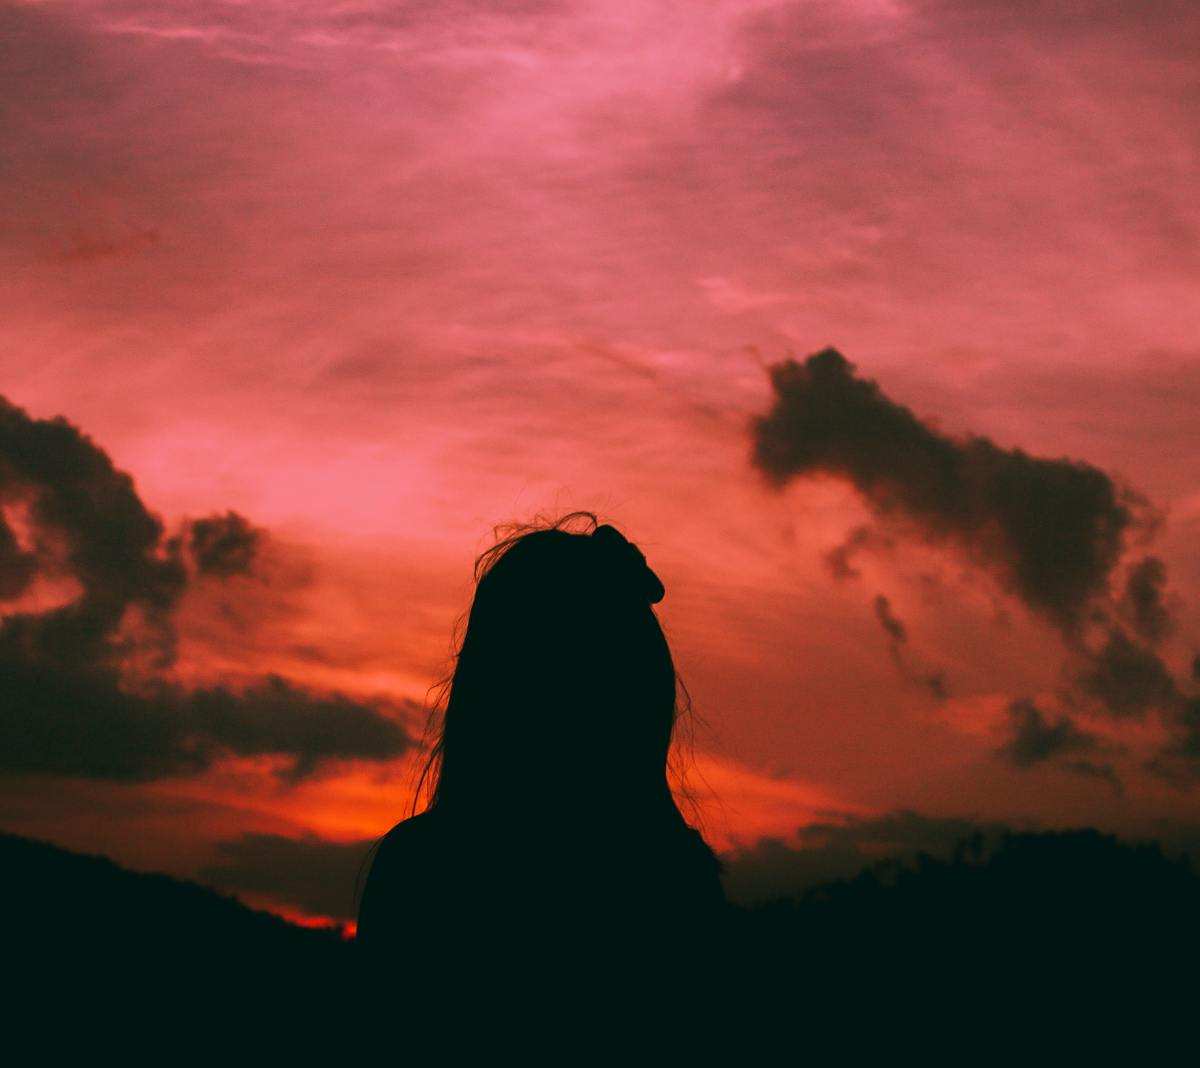 Shadowed Past - A Poem